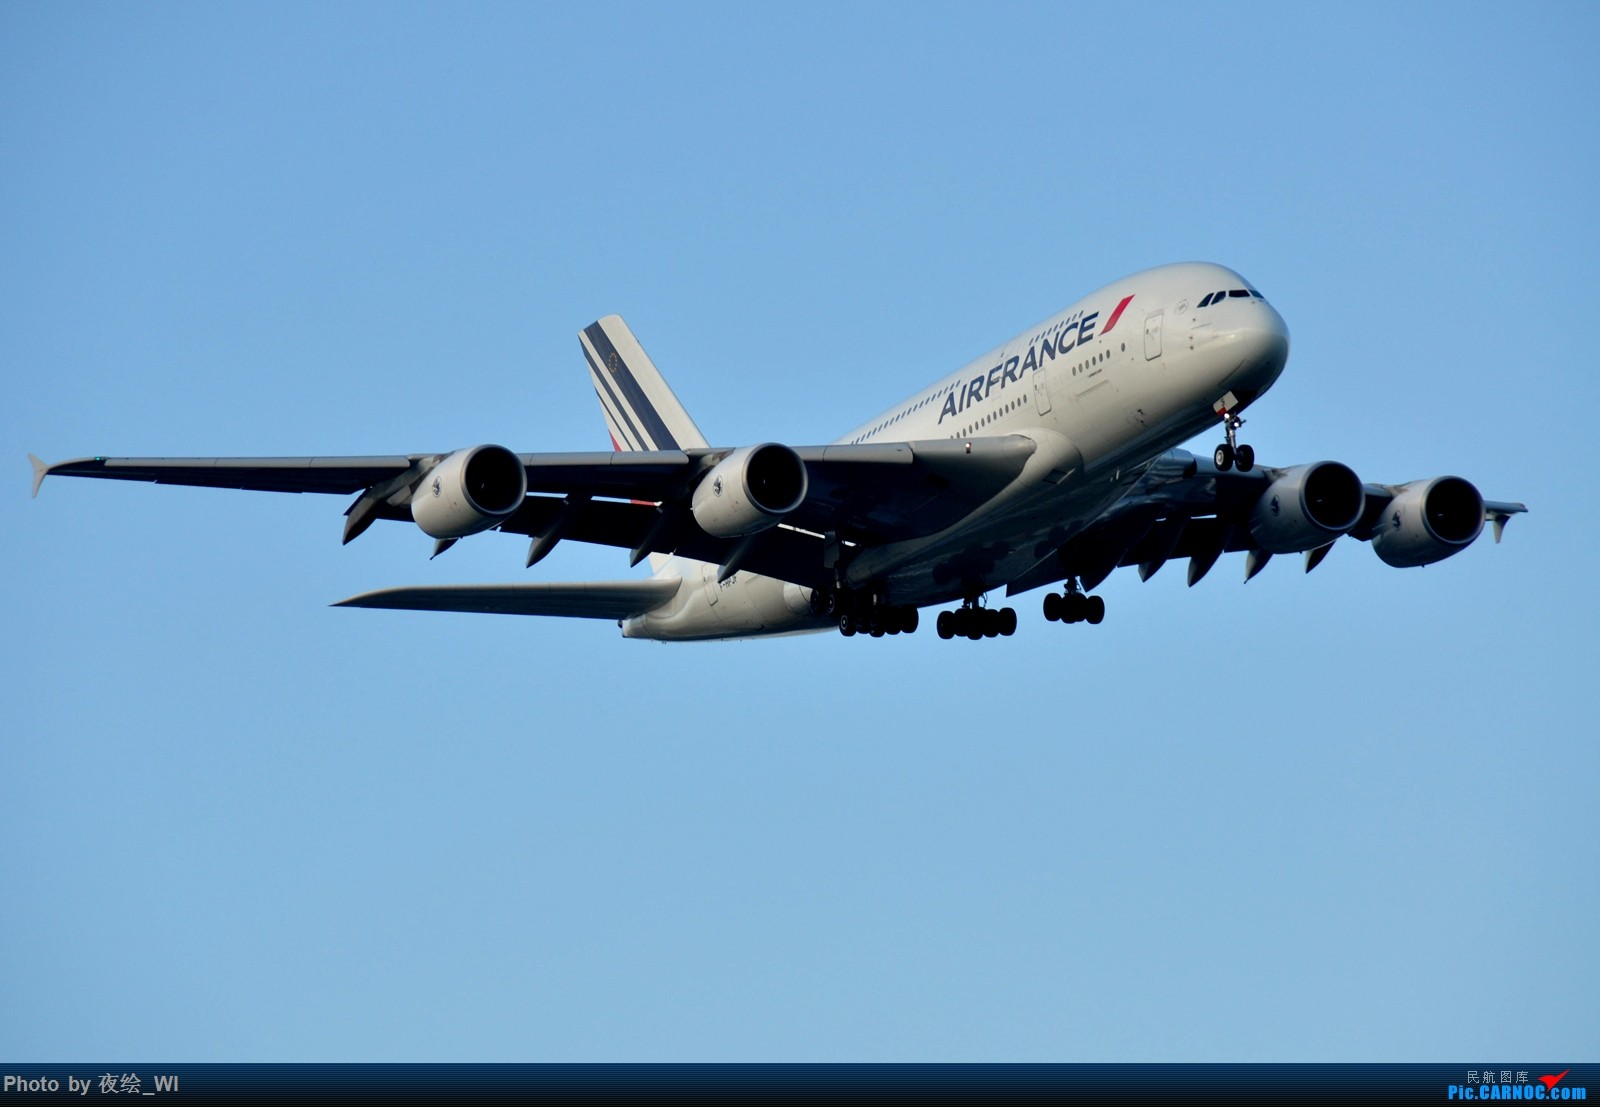 Re:[原创]【PVG】不只守着NKG,国庆疯狂拍机之浦东行,天空美得简直不像话! AIRBUS A380-800 P-HPJF 中国上海浦东国际机场